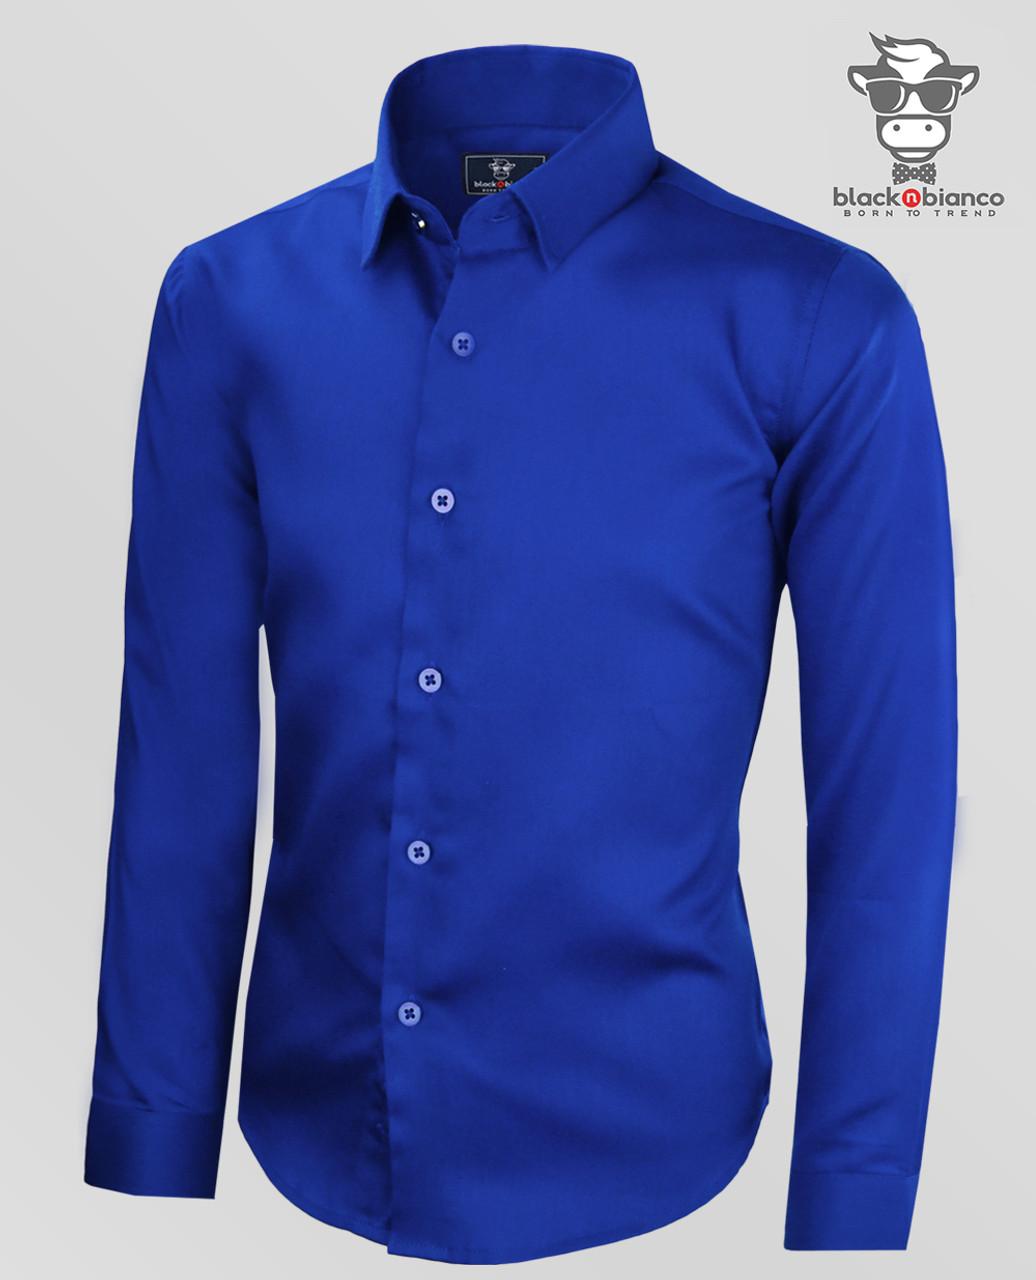 f118c9dd8d04 Boys Sateen Royal Blue Long Sleeve Dress Shirt. Signature Series by Black N  Bianco